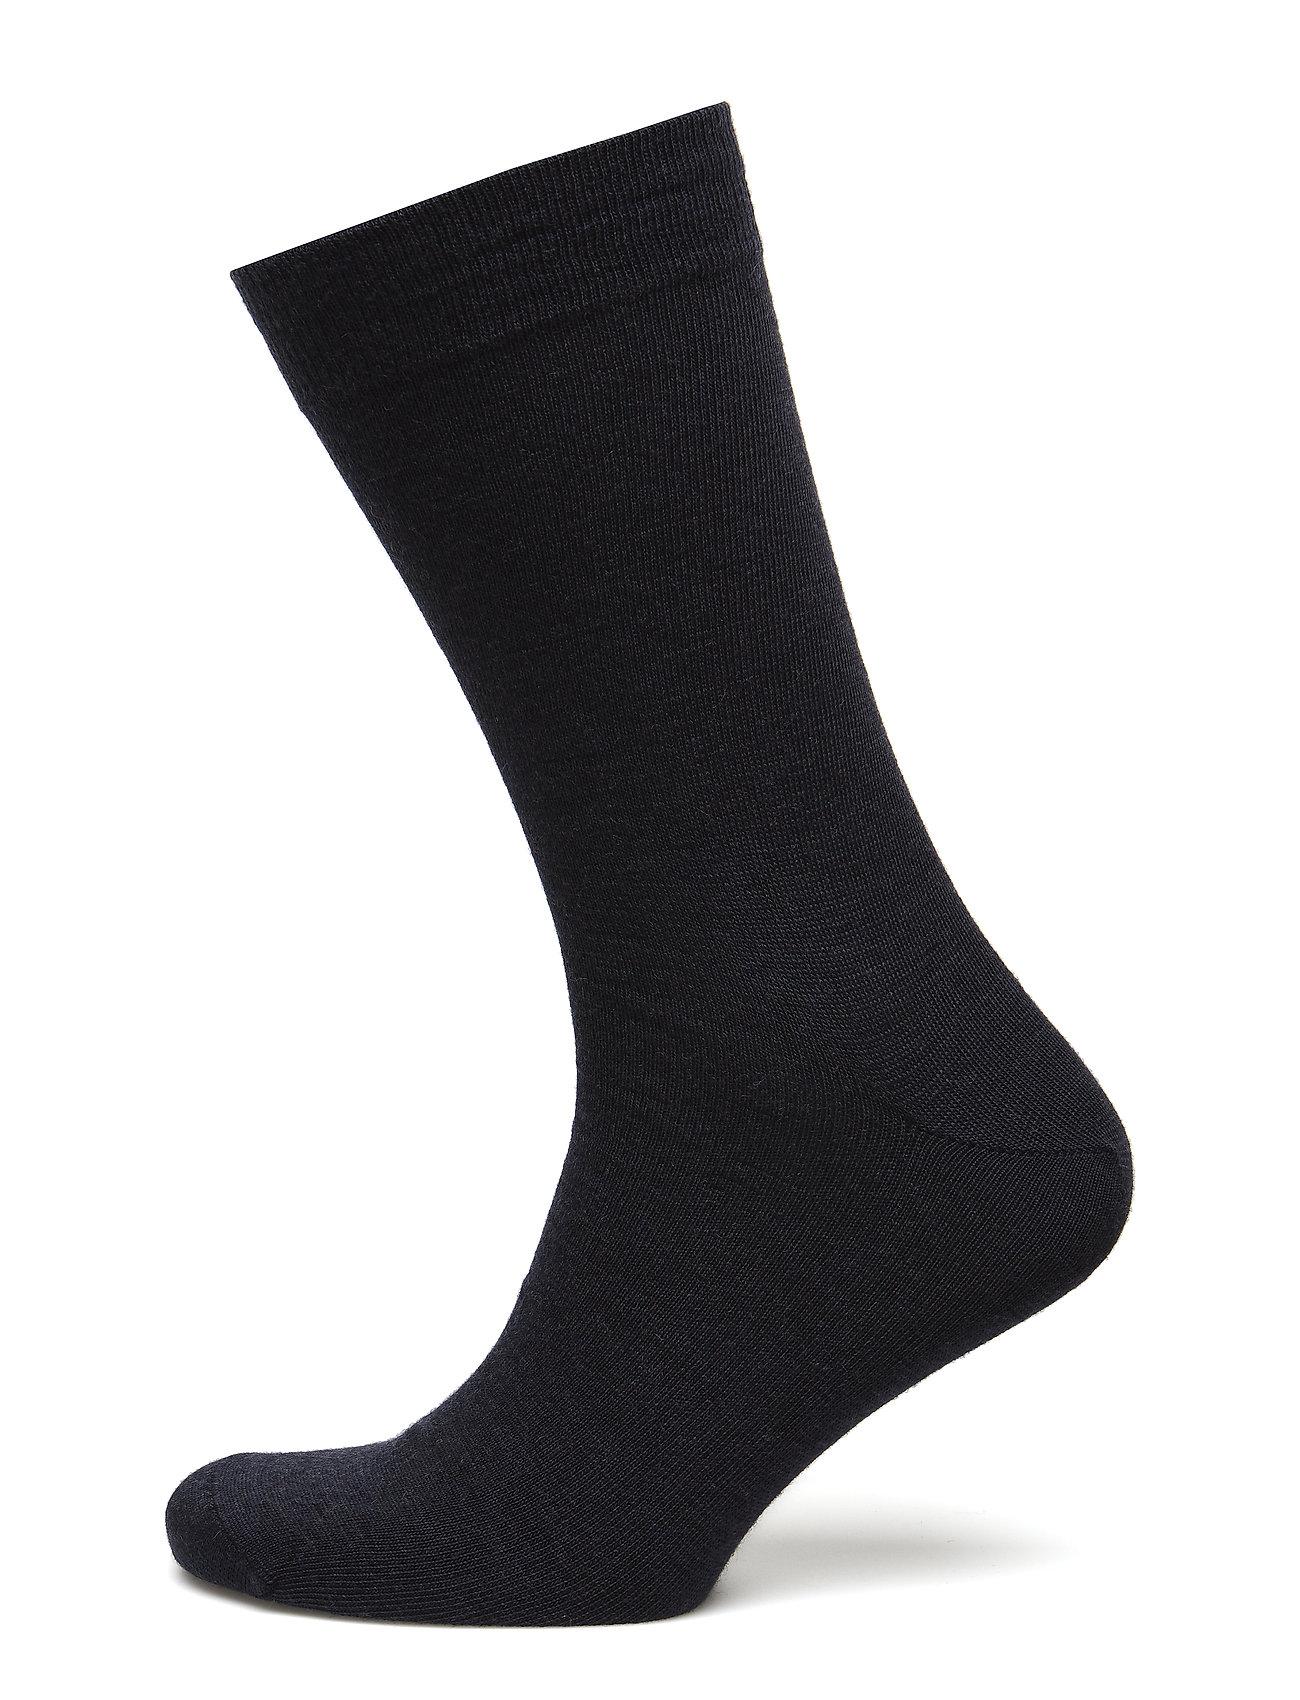 Image of Egtved Socks Cotton/Wool Twin, Underwear Socks Regular Socks Sort Egtved (3101135393)